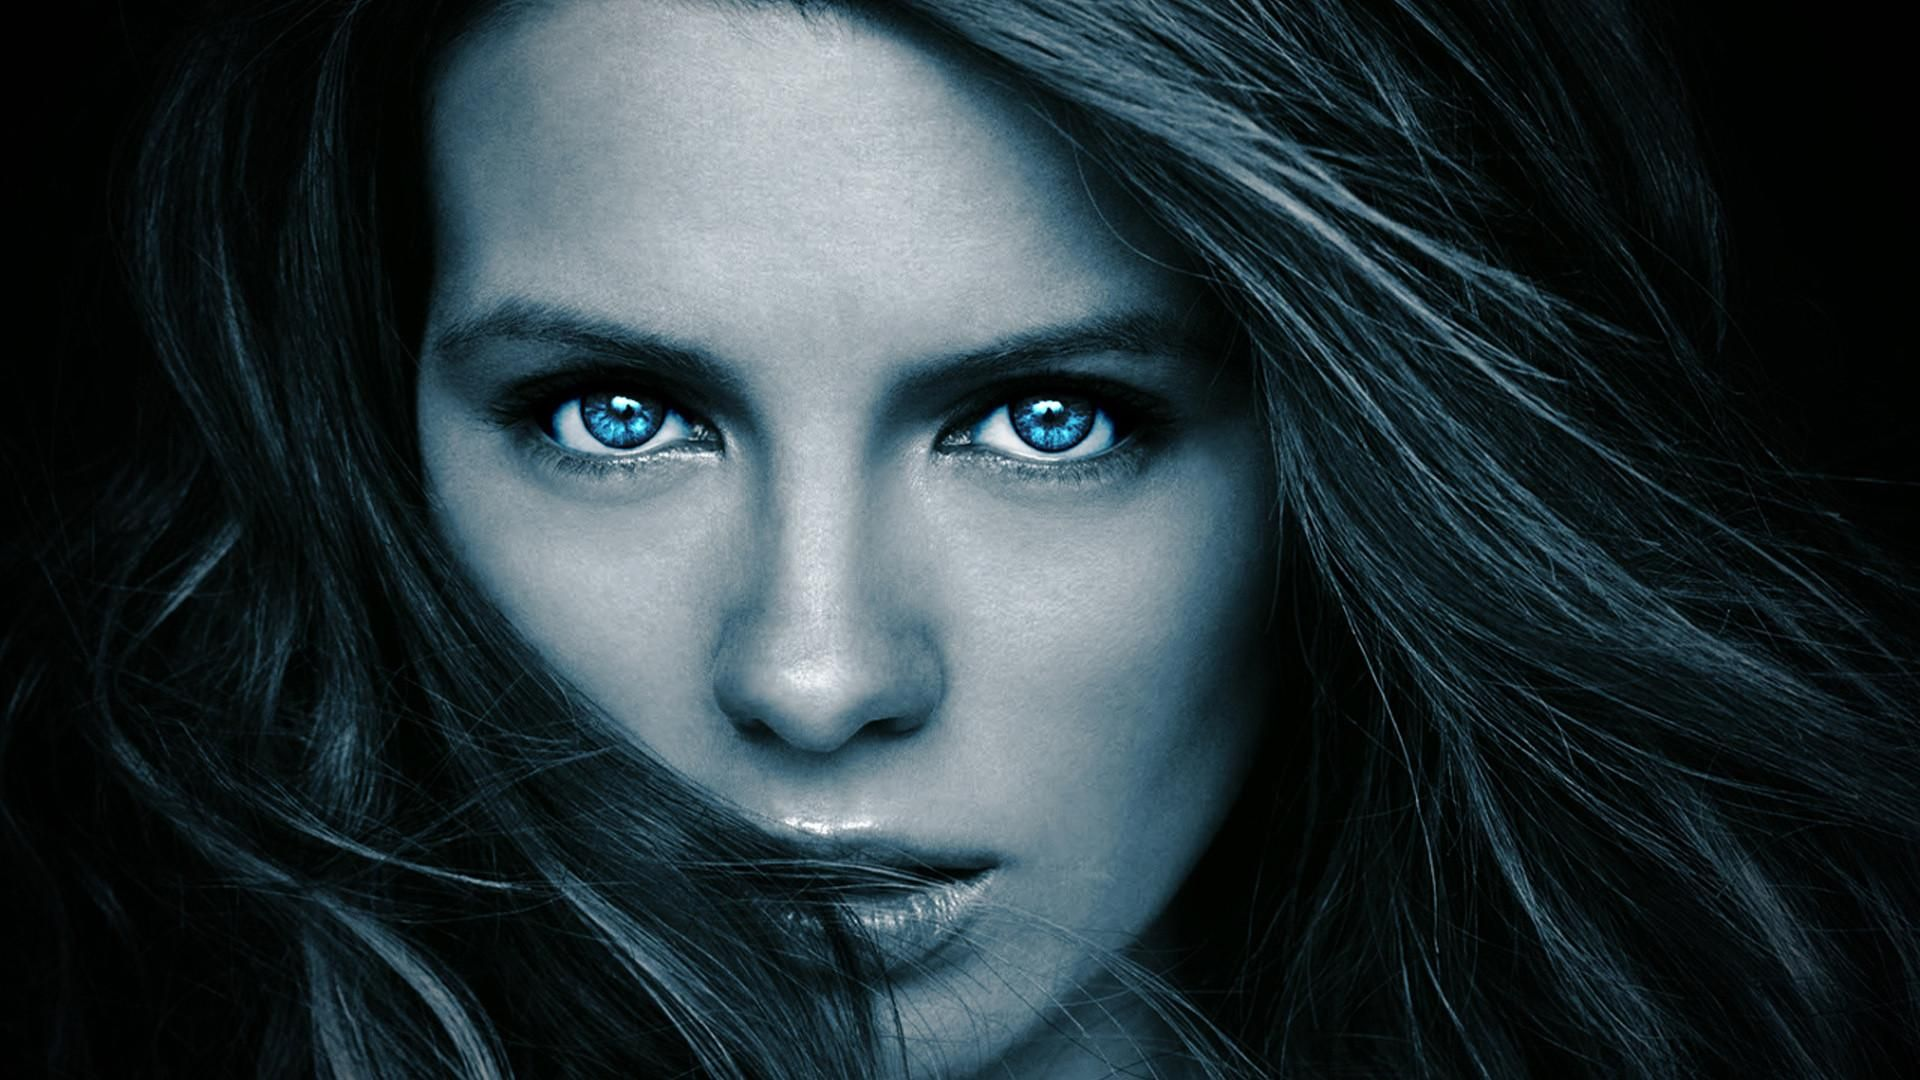 Kate Beckinsale Wallpapers Find best latest Kate Beckinsale